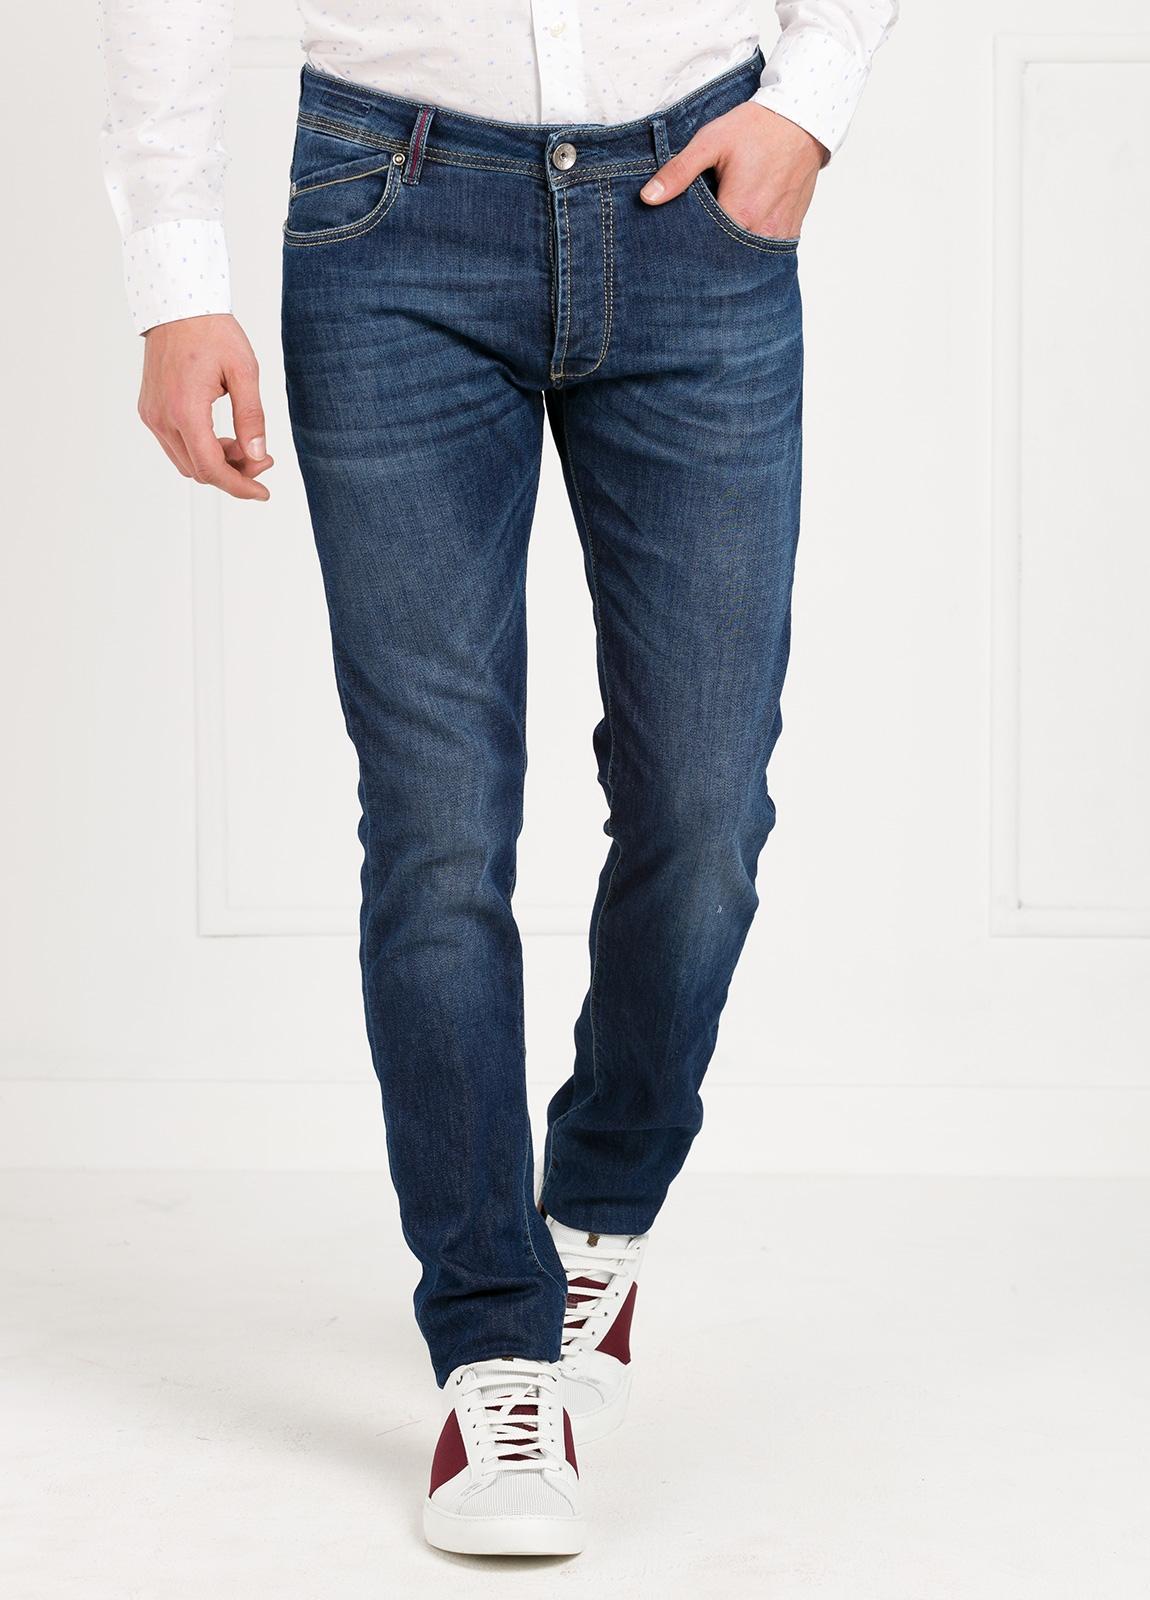 Pantalón tejano modelo POLLOCK P053 color azul. 92% Algodón, 6% Elastomultiéster, 2% Elastáno. - Ítem3